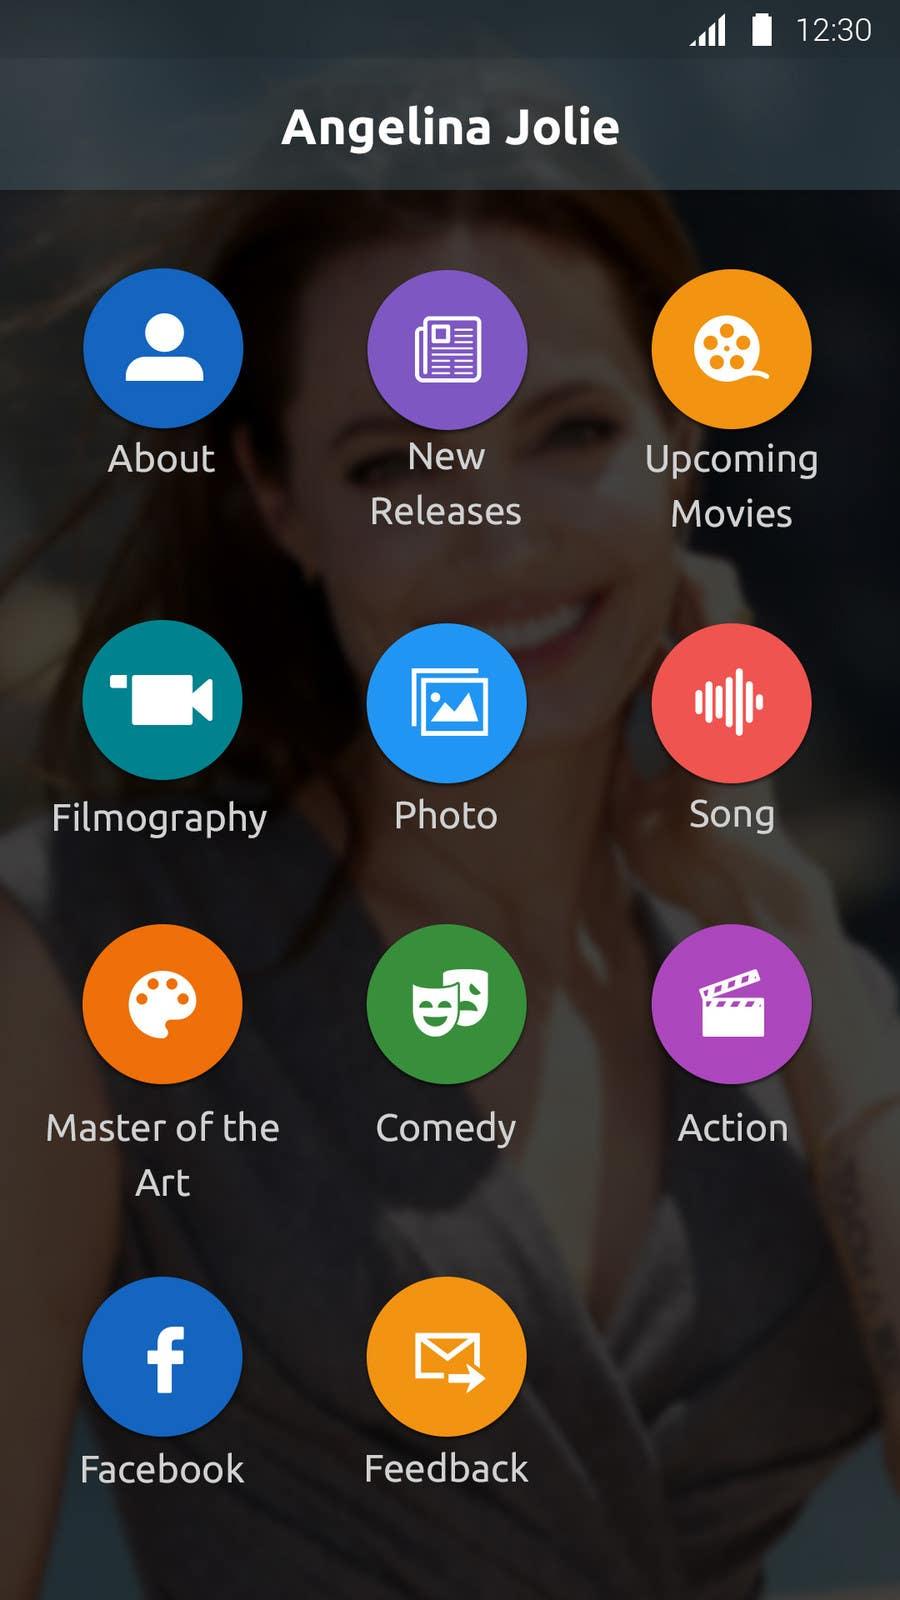 Konkurrenceindlæg #                                        21                                      for                                         Improve an App Home Screen Mockup